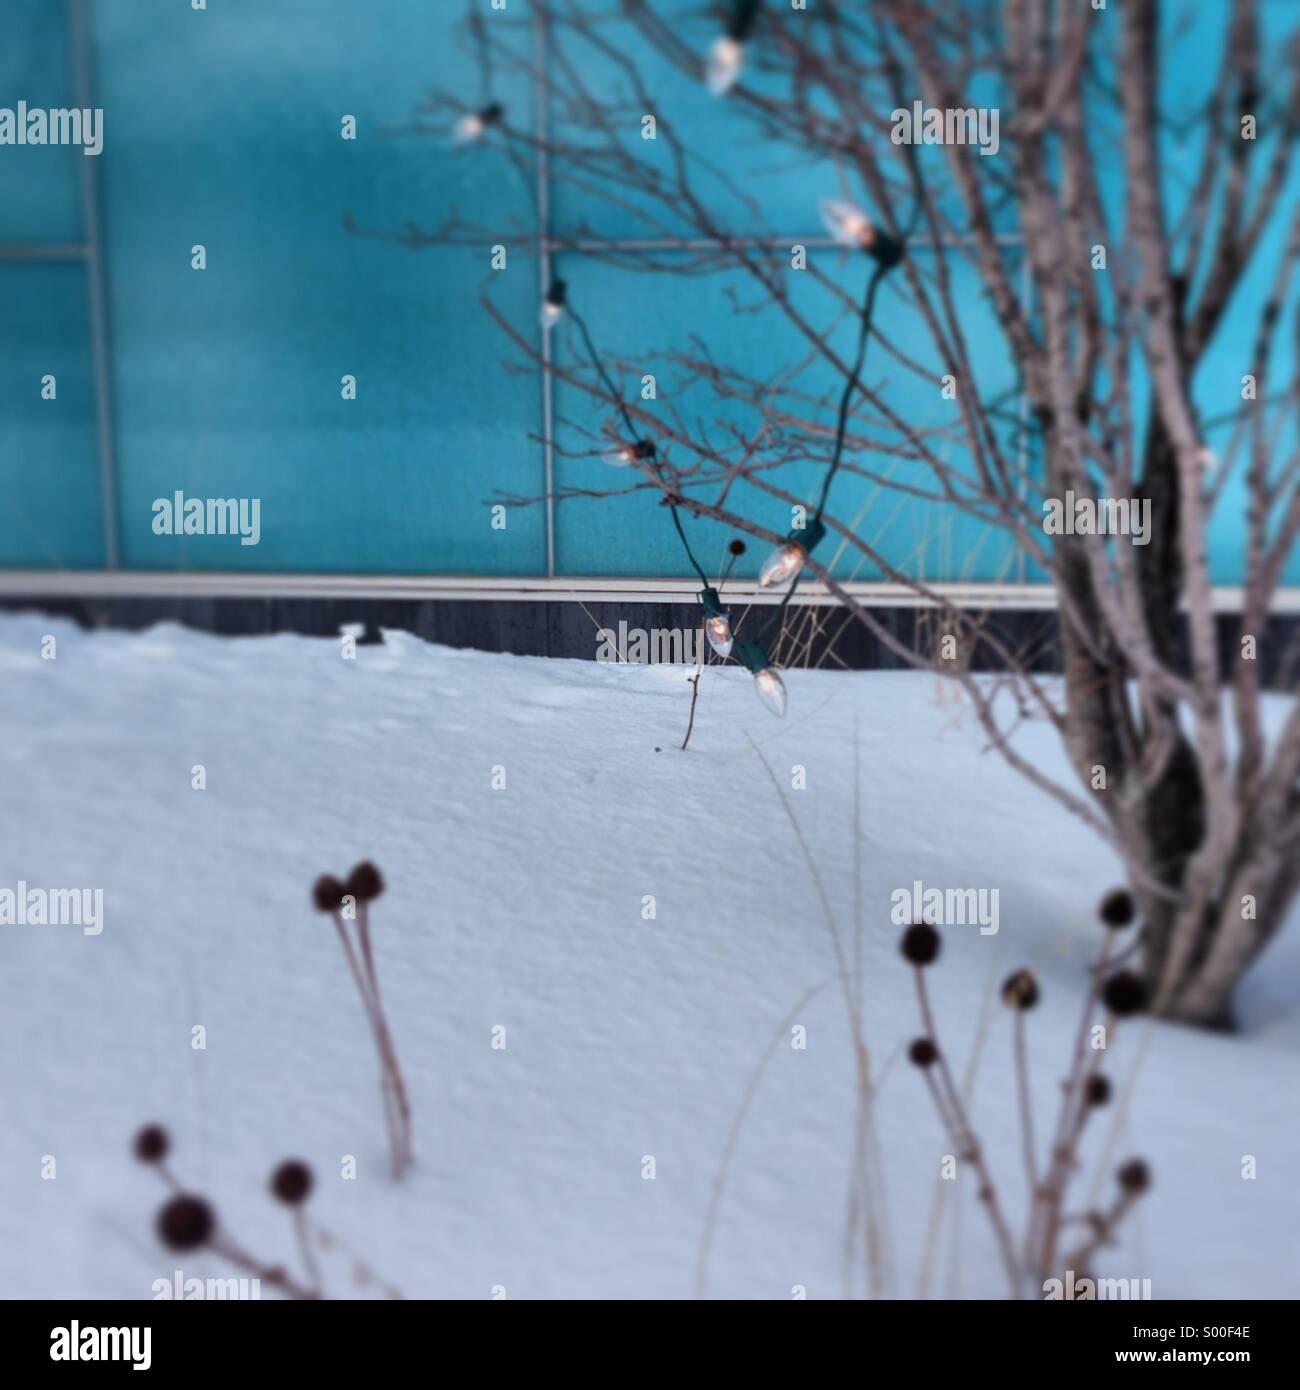 Winter-Szene, Schnee, Urlaub Weihnachtsbeleuchtung. Stockbild